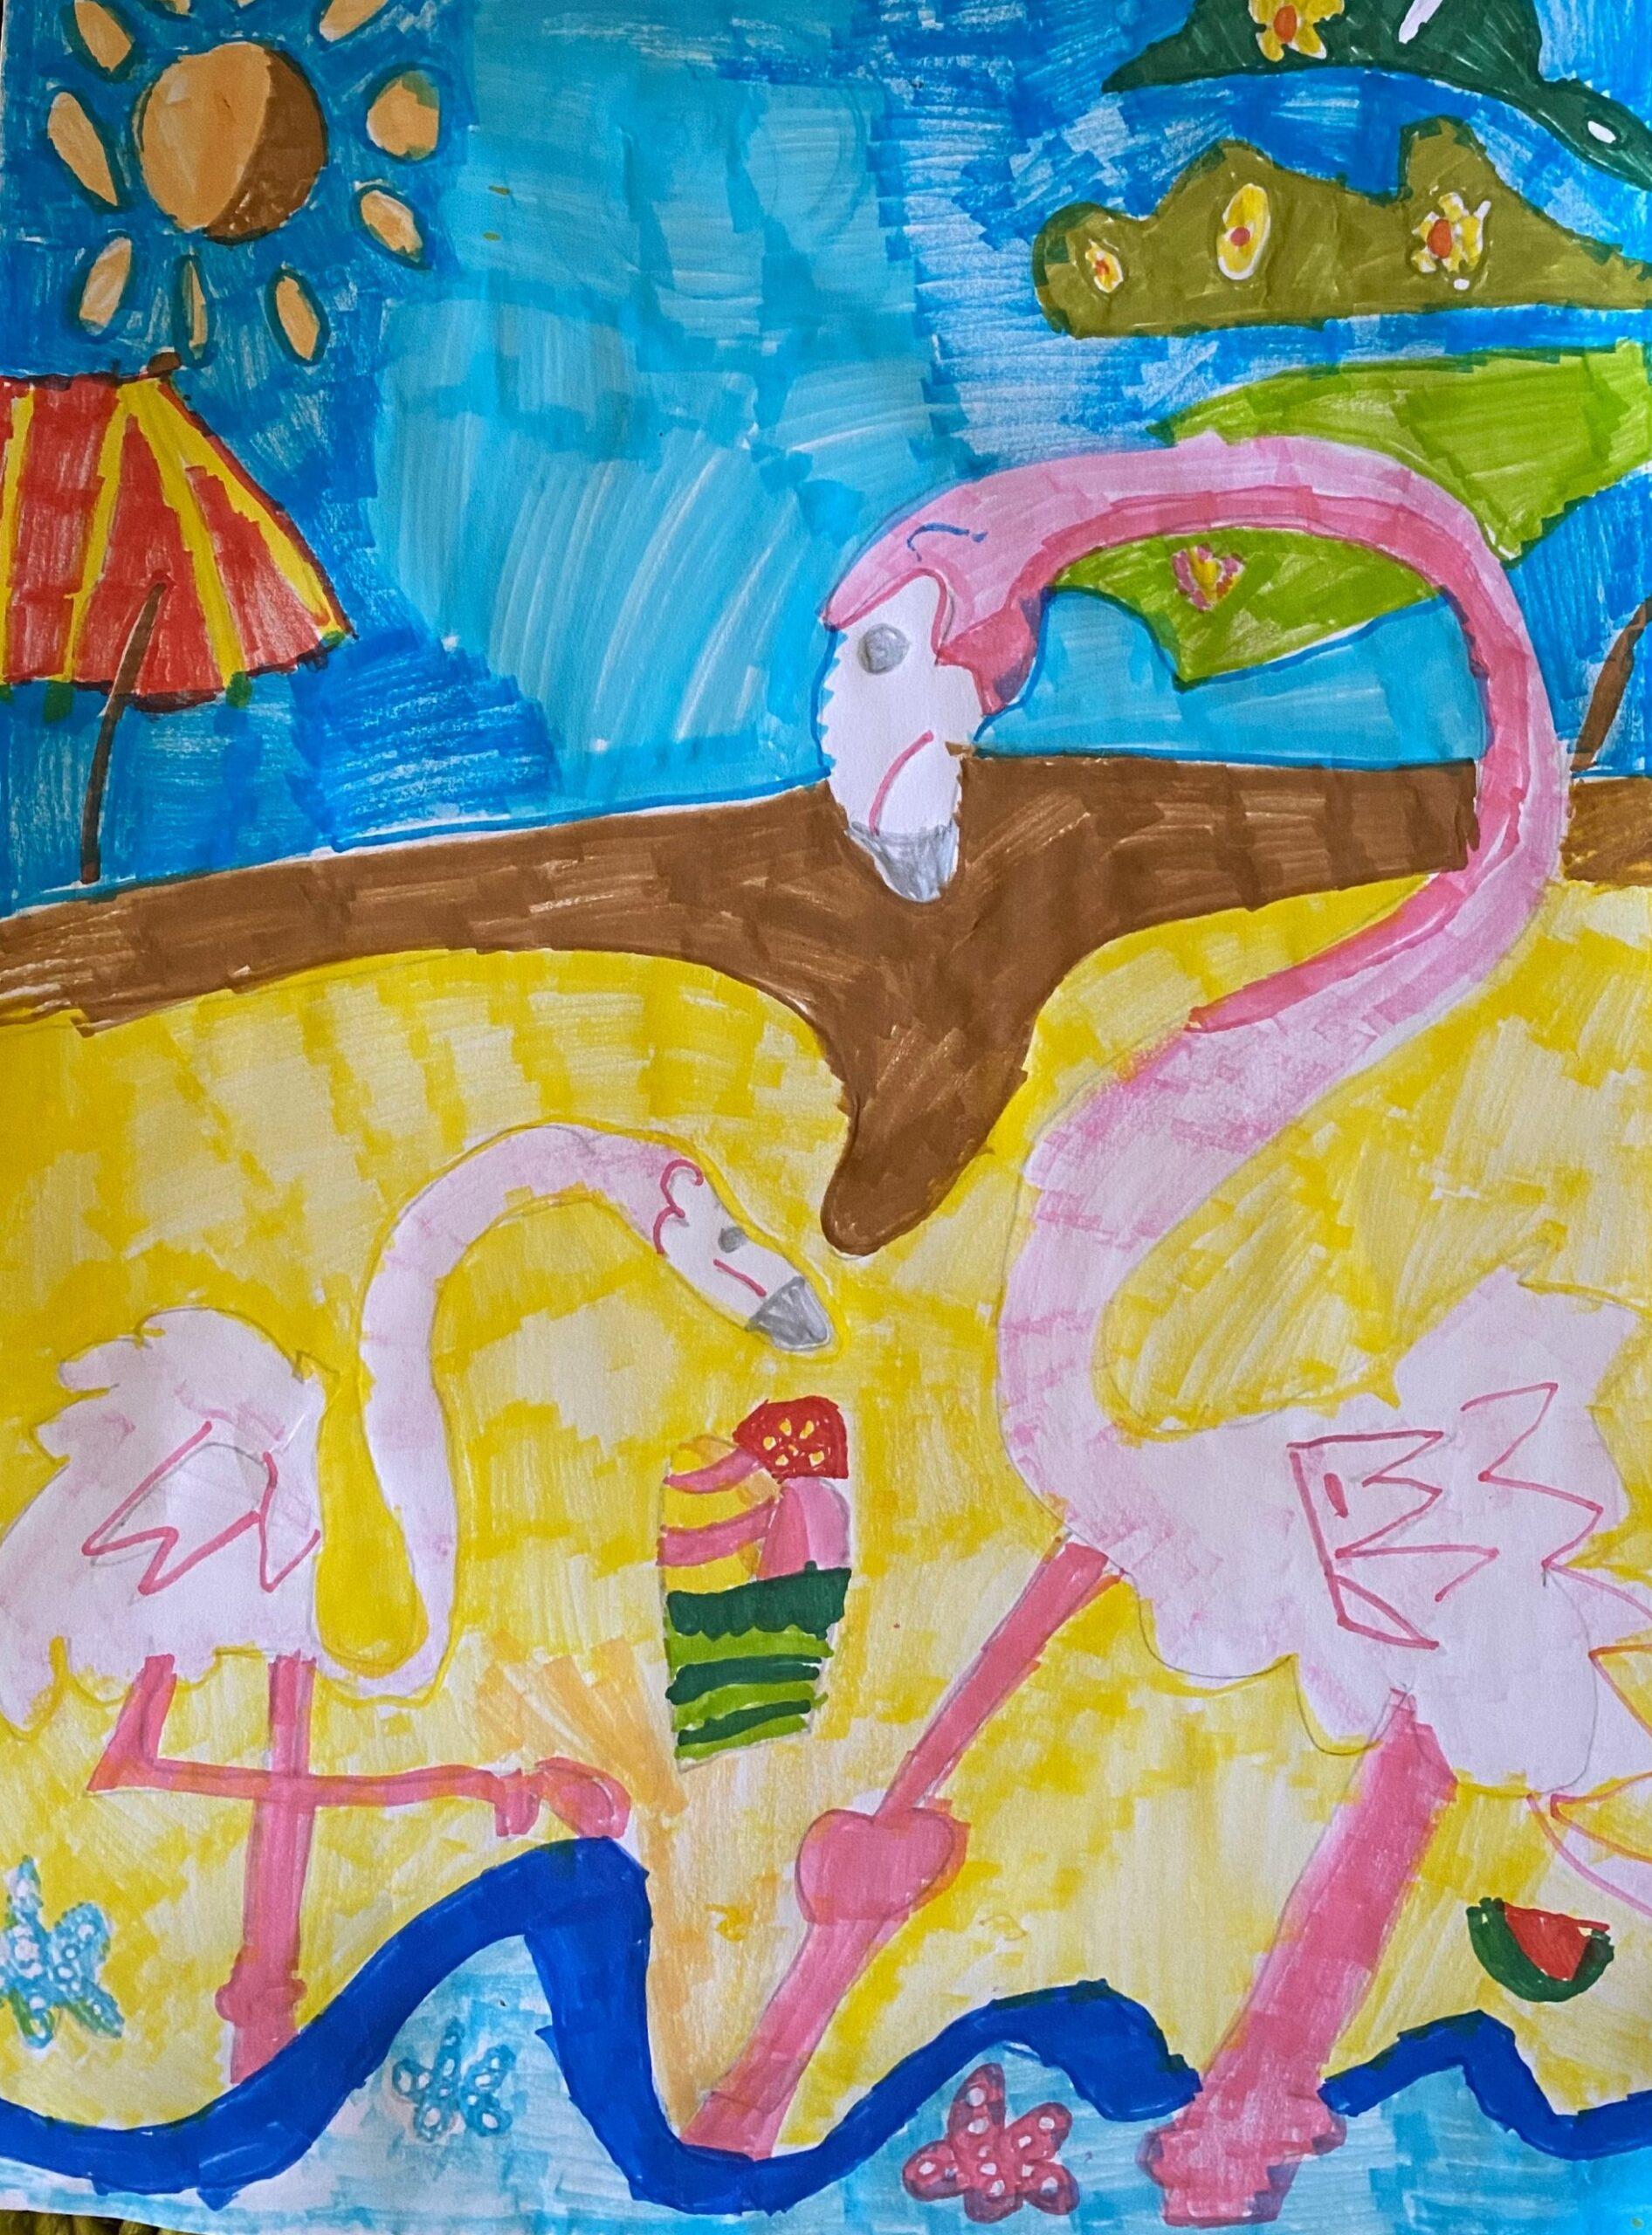 Ras Al Khor Sanctuary by Kylie Reese E. Monteser